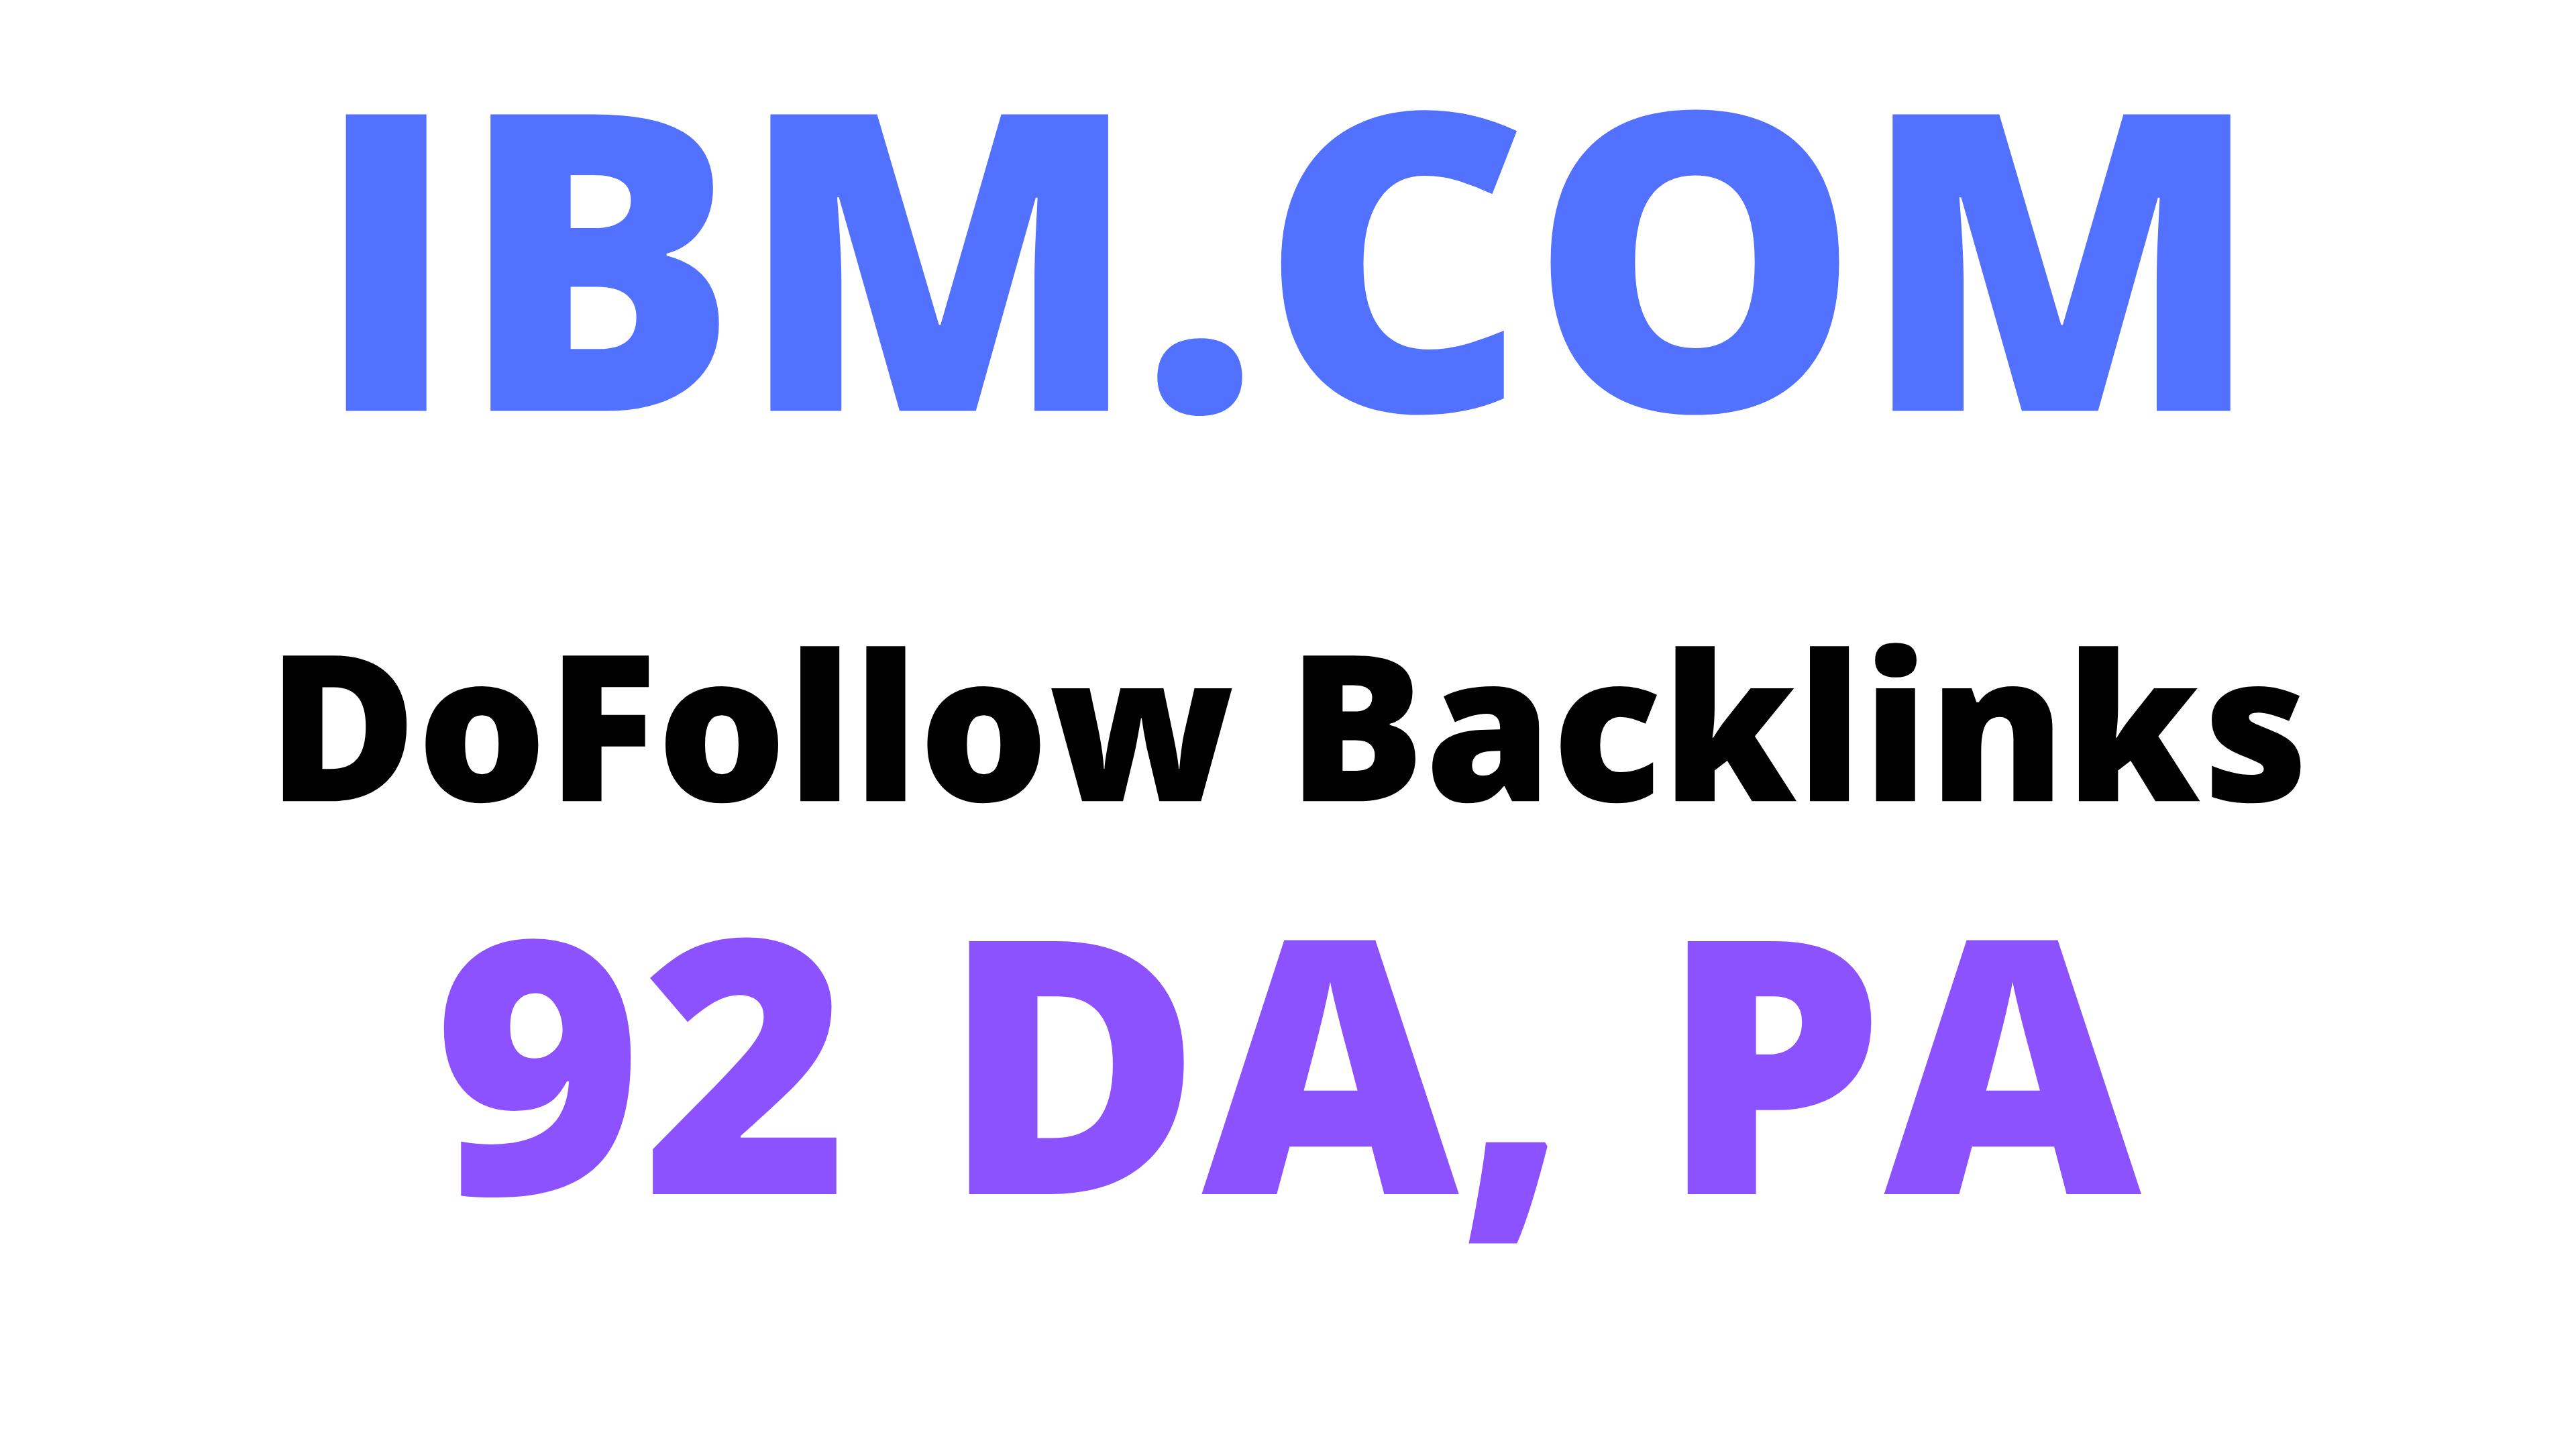 2 IBM DoFollow Backlinks 92 DA,  PA High Authority Backlinks